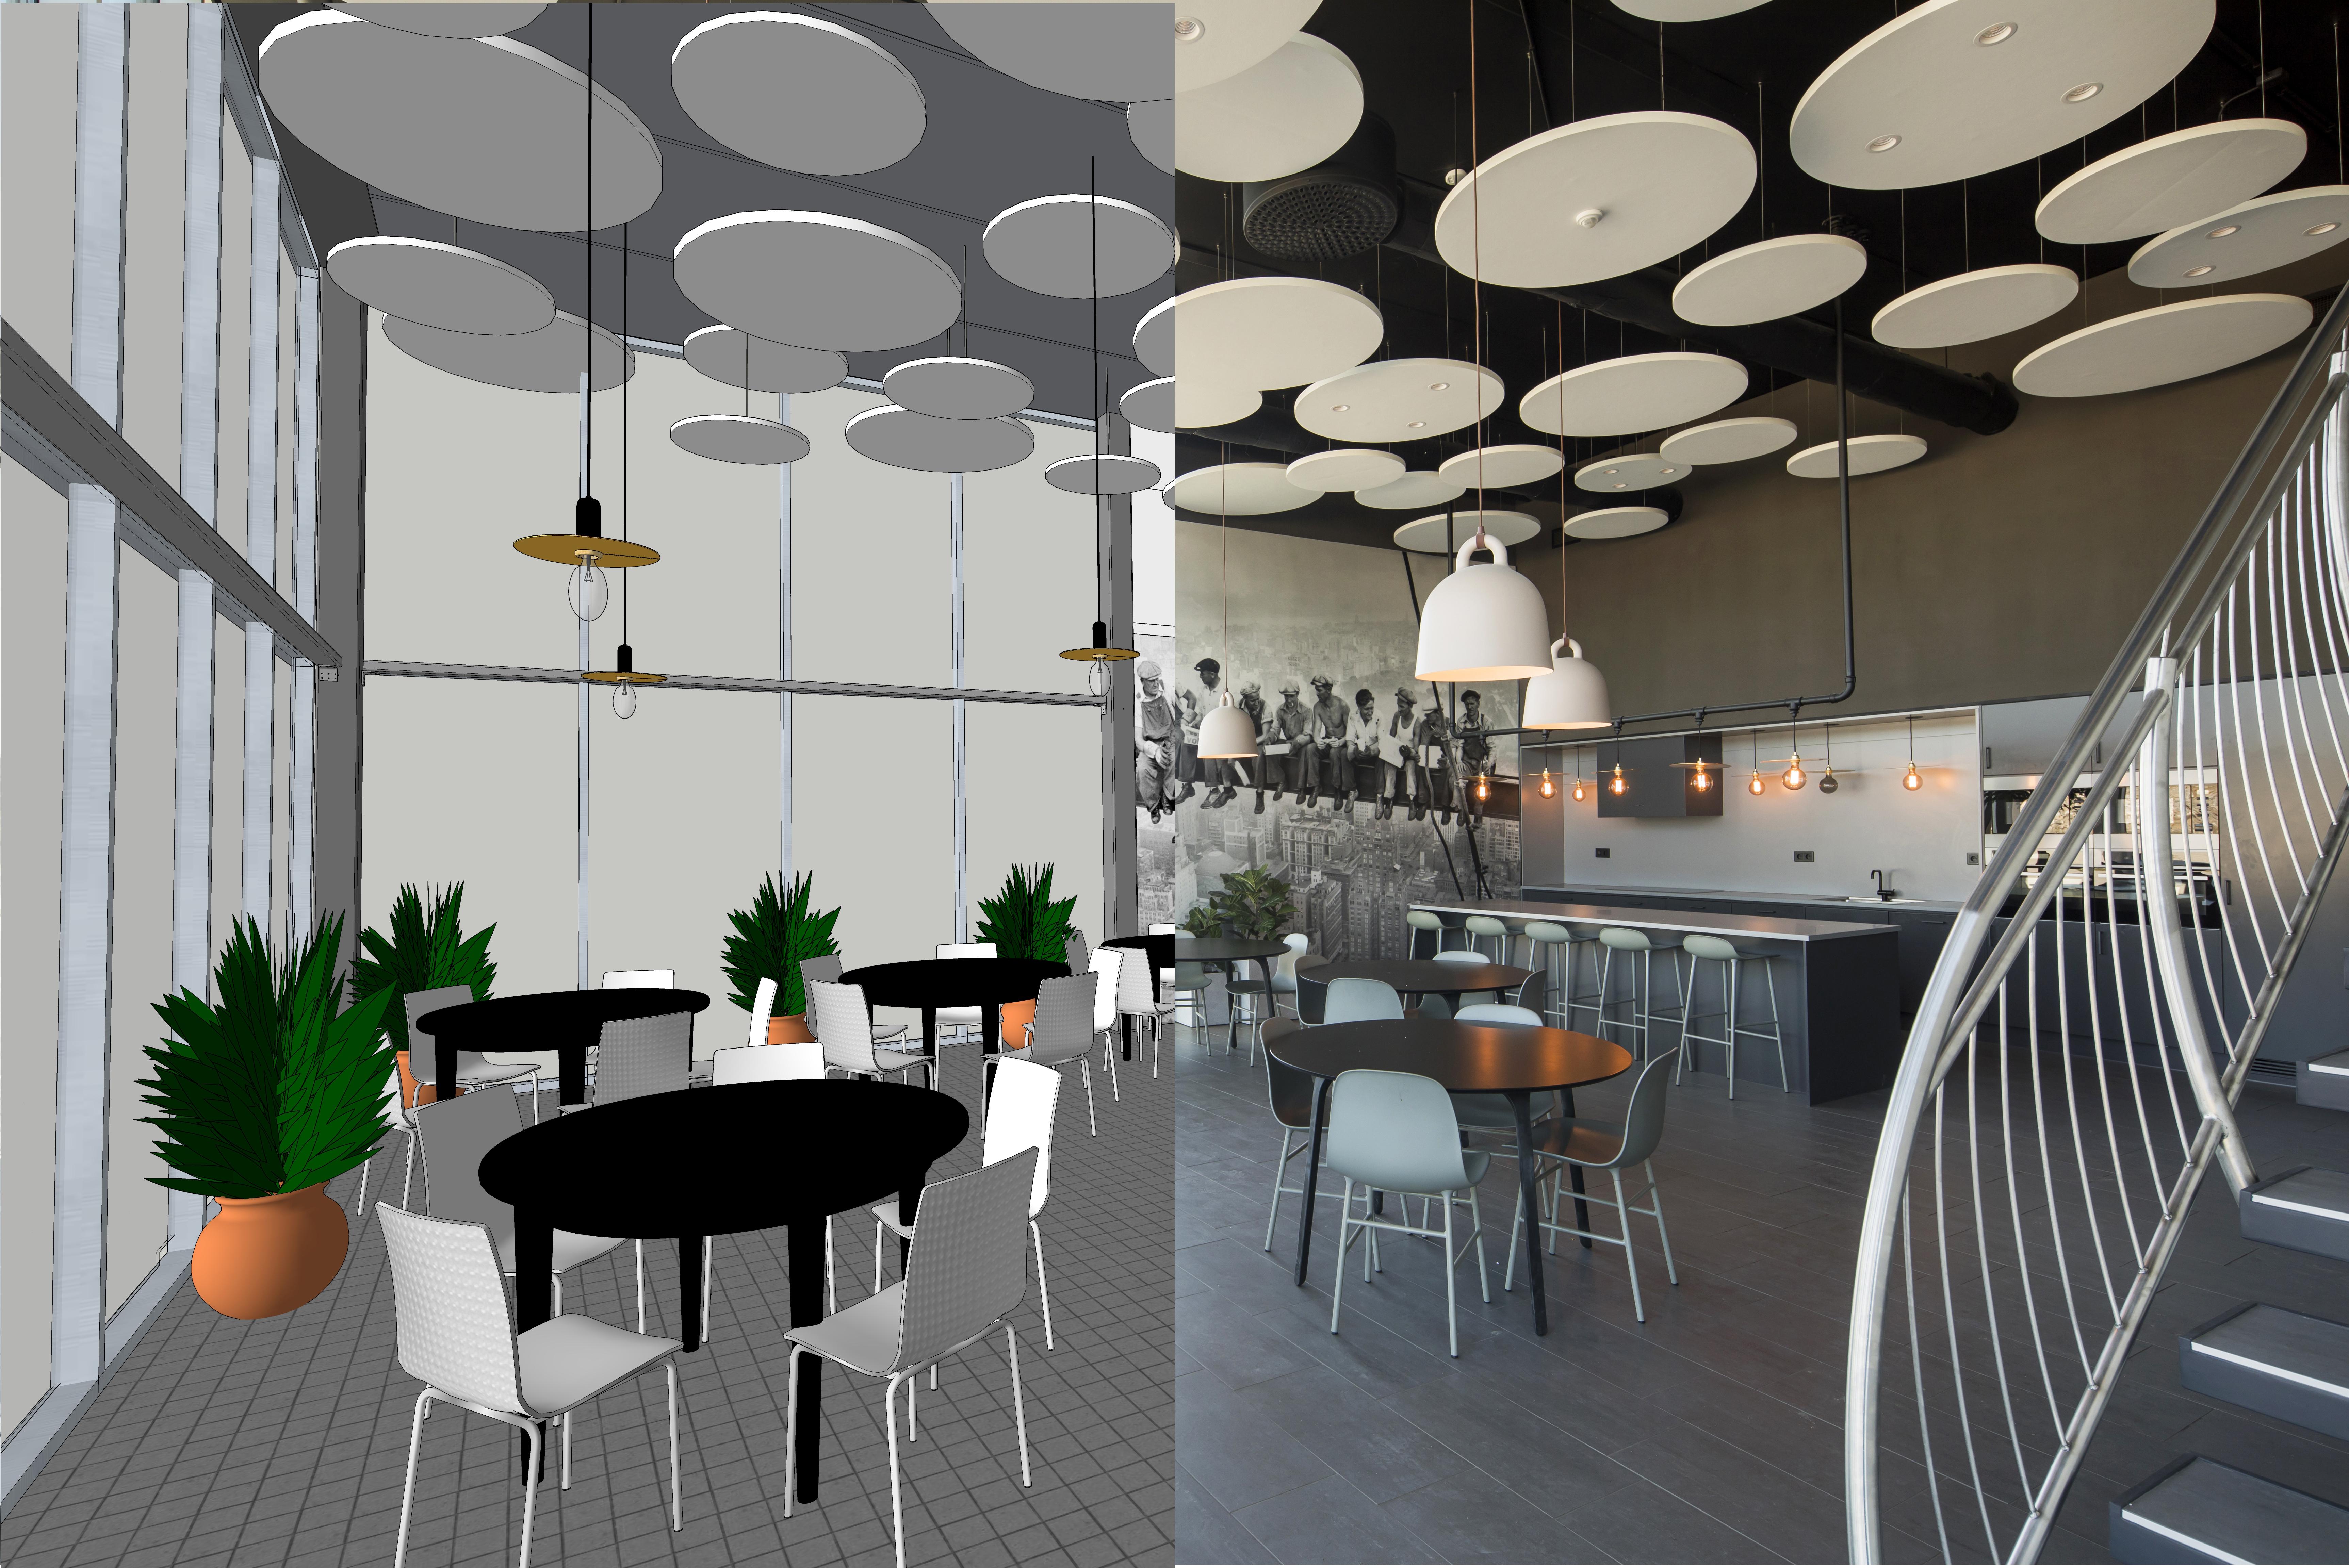 Widok na jadalnię w biurowcu Northpower Stålhallar.